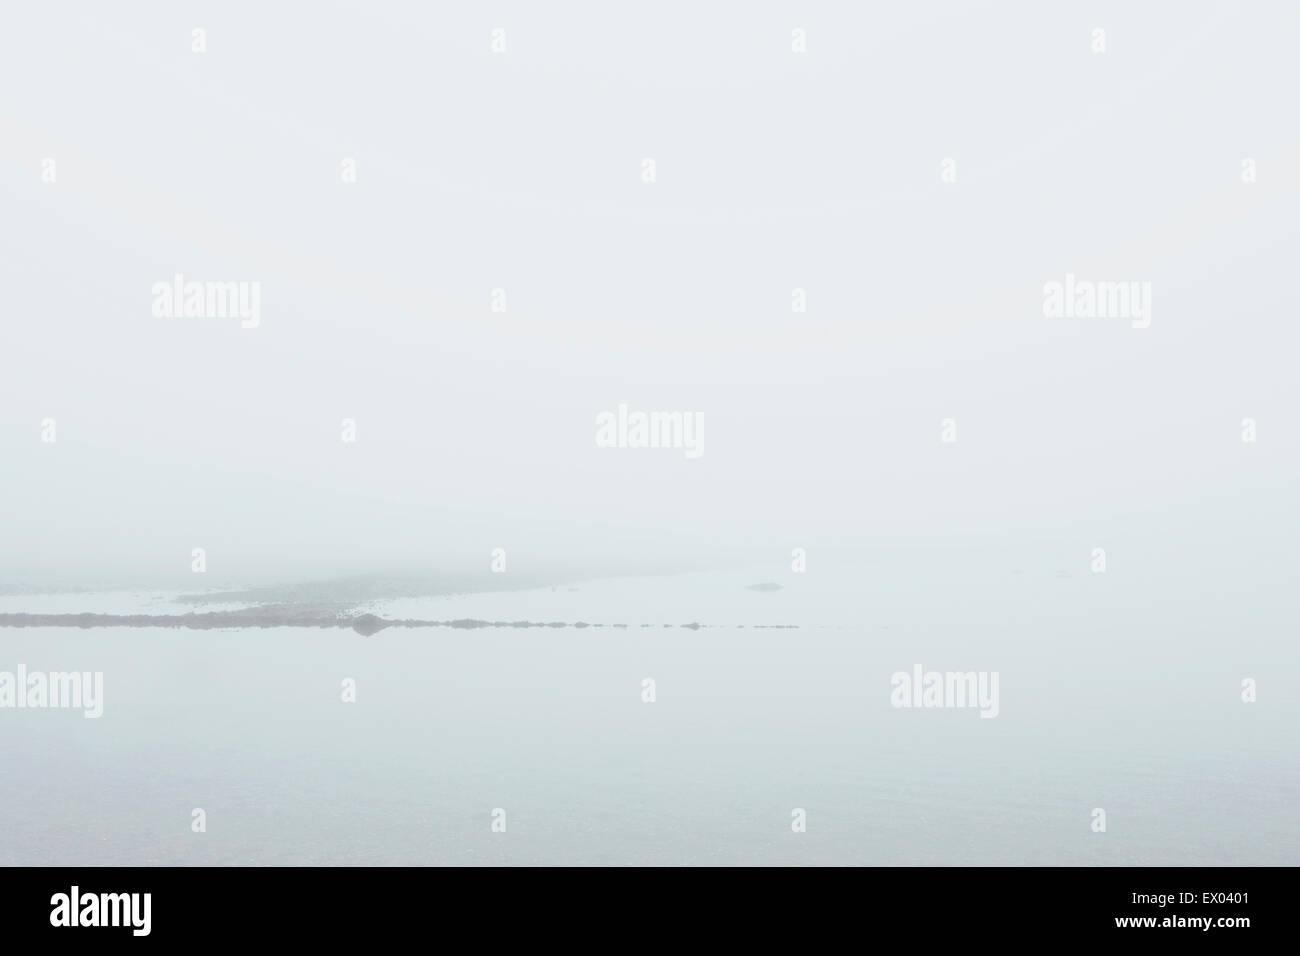 Misty view, West coast of Scotland - Stock Image